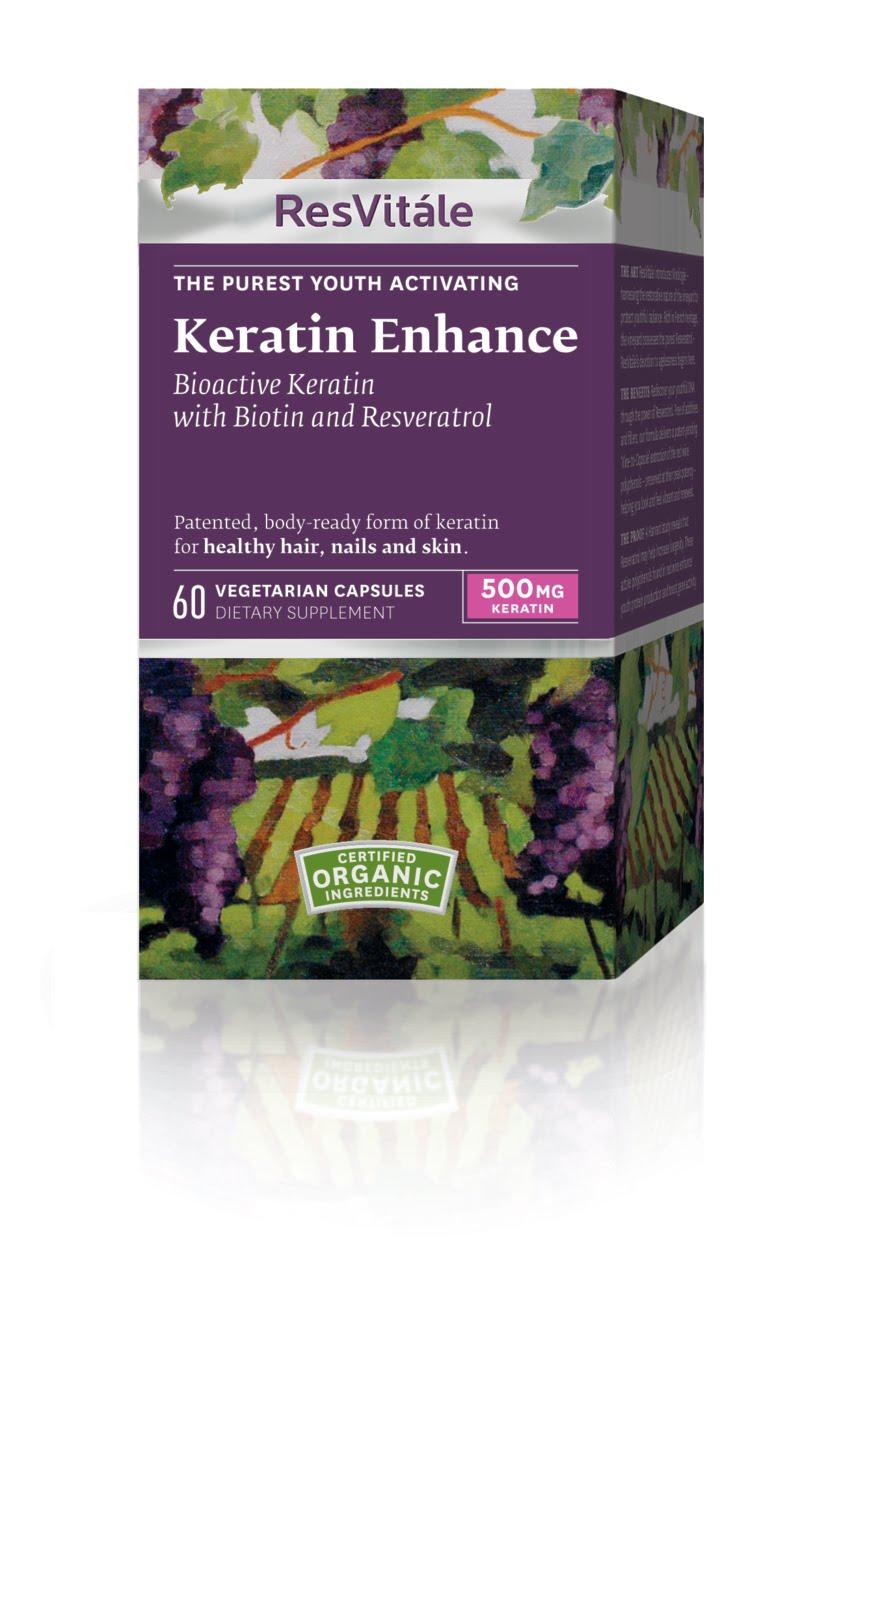 Chic Mummy: Product Review: ResVitale Keratin Enhance